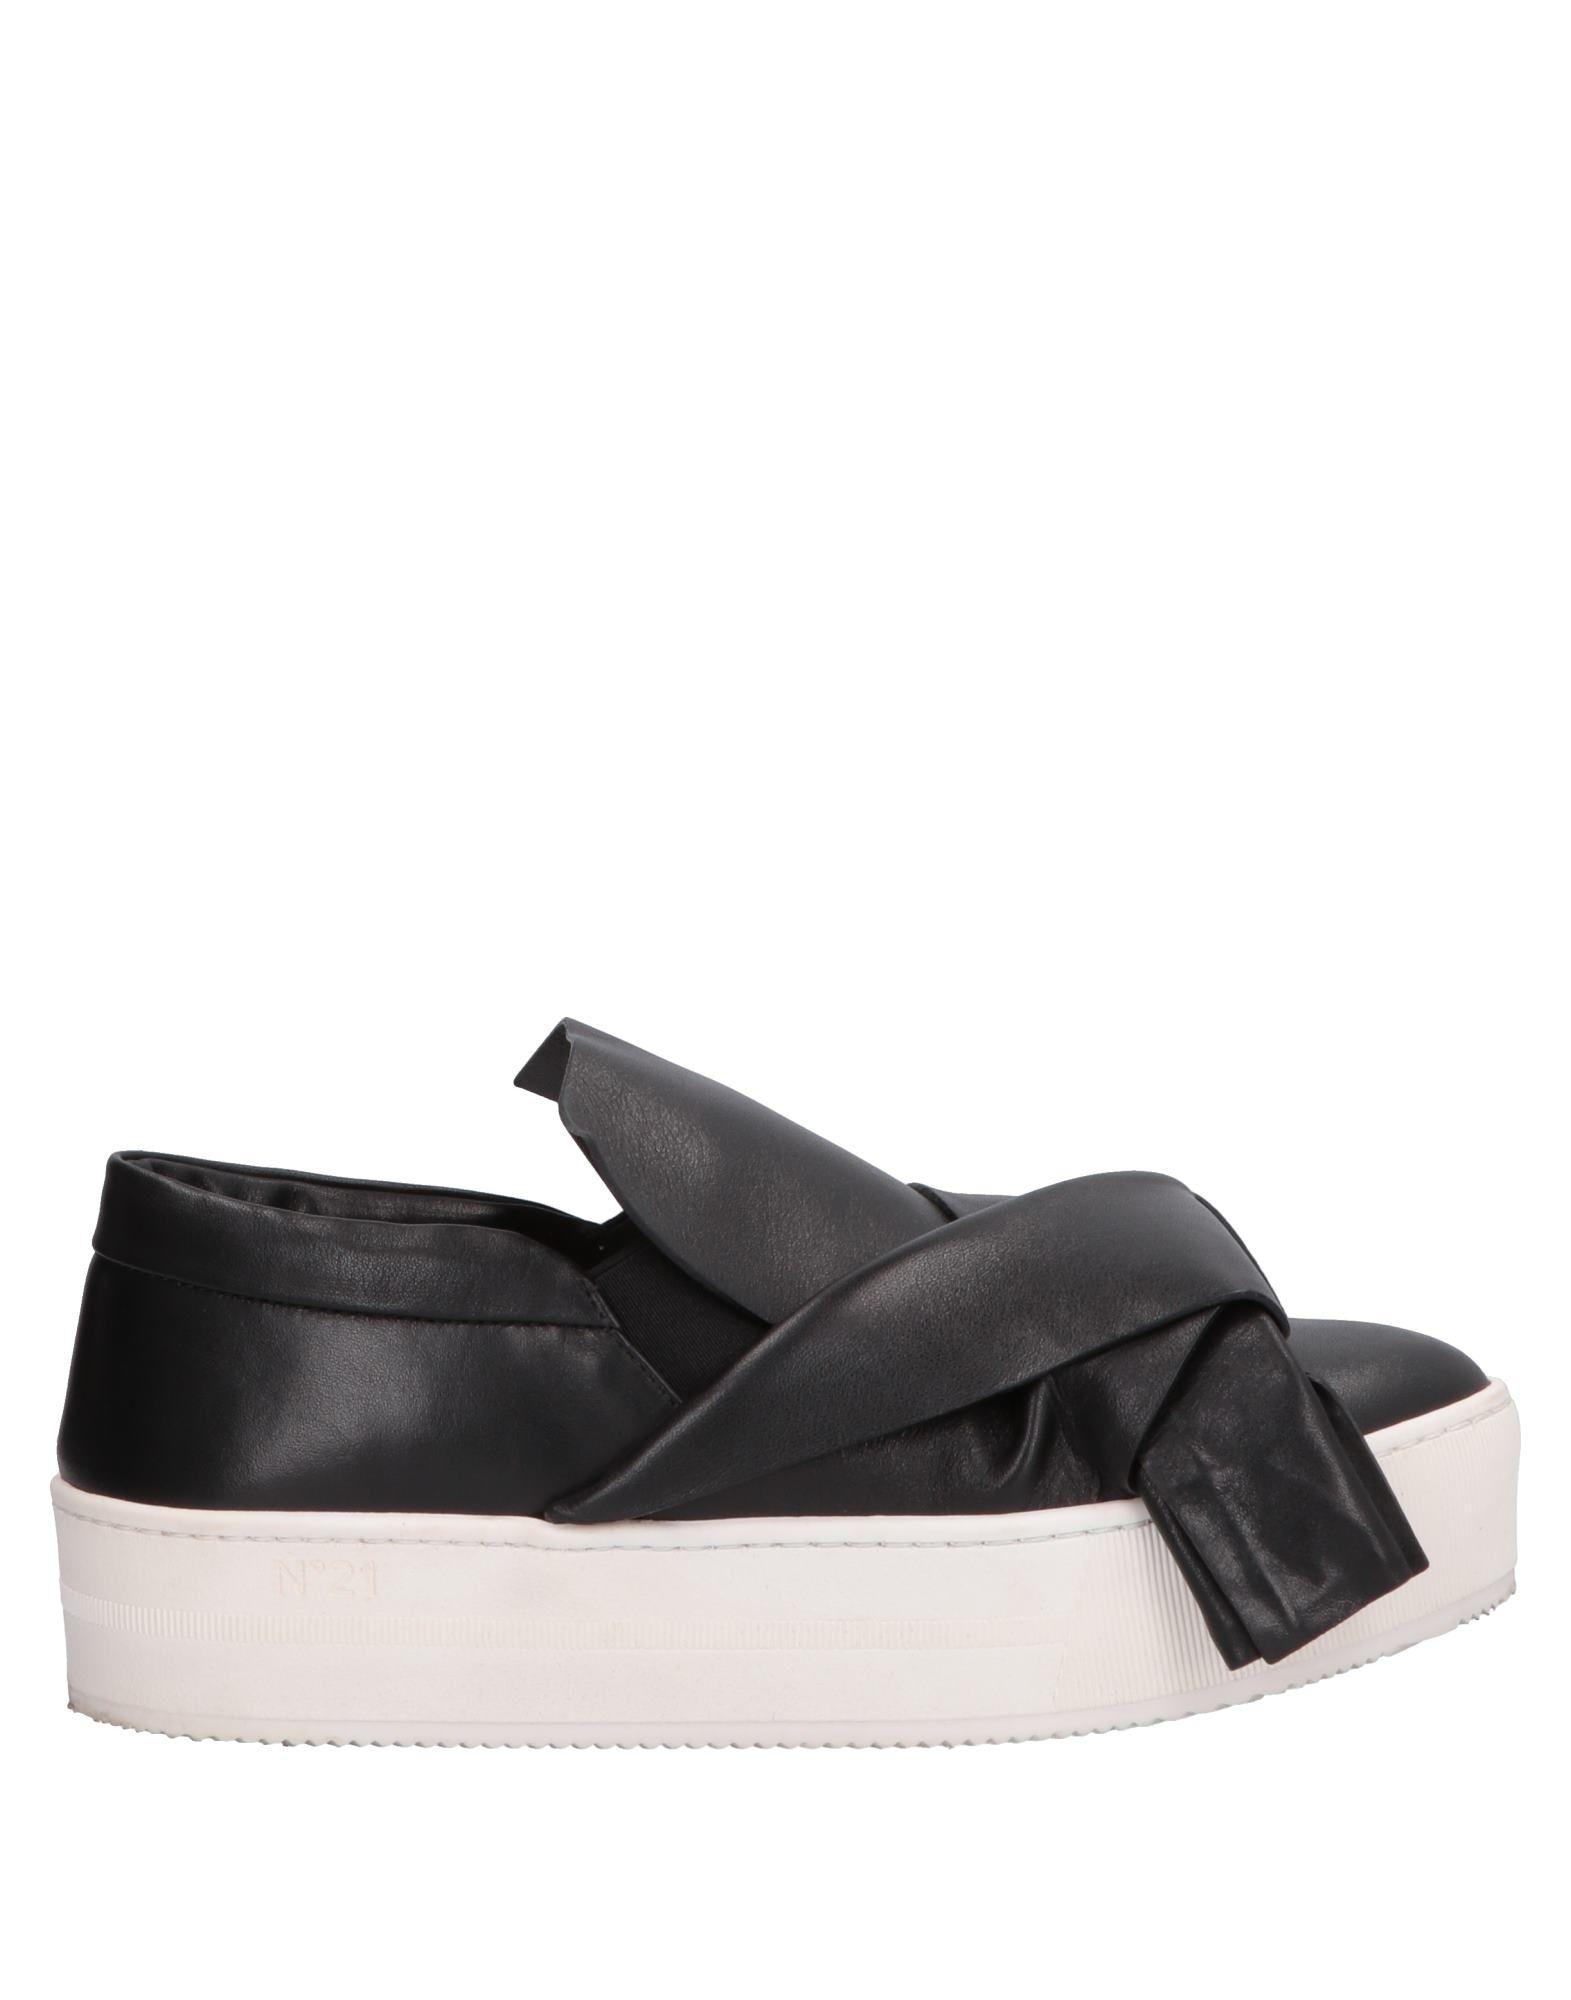 N° 21 Sneakers Sneakers - Women N° 21 Sneakers Sneakers online on  Australia - 11569640HH d17823